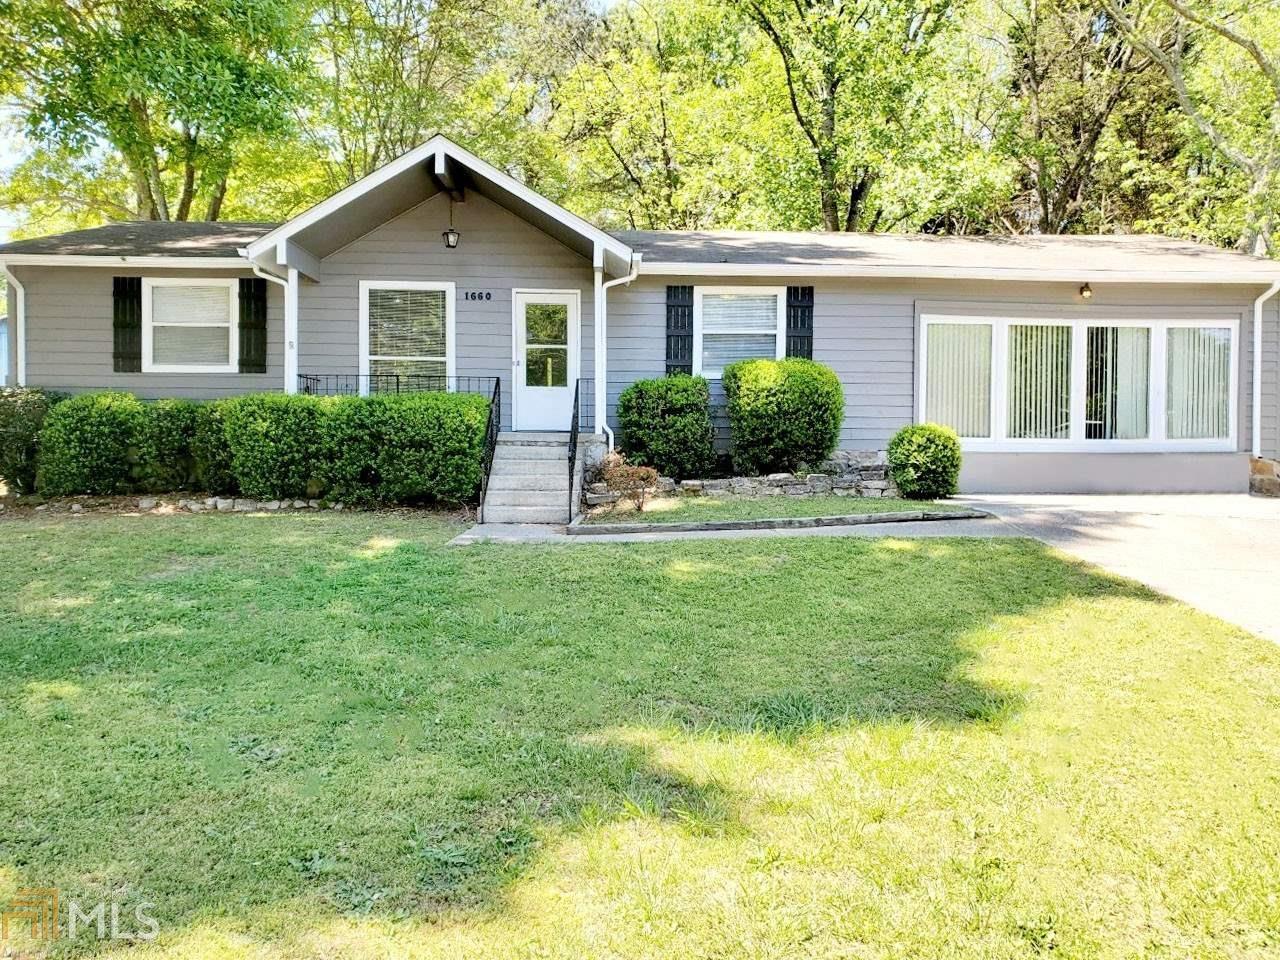 1660 Almand Creek Dr, Conyers, GA 30094 - MLS#: 8773464